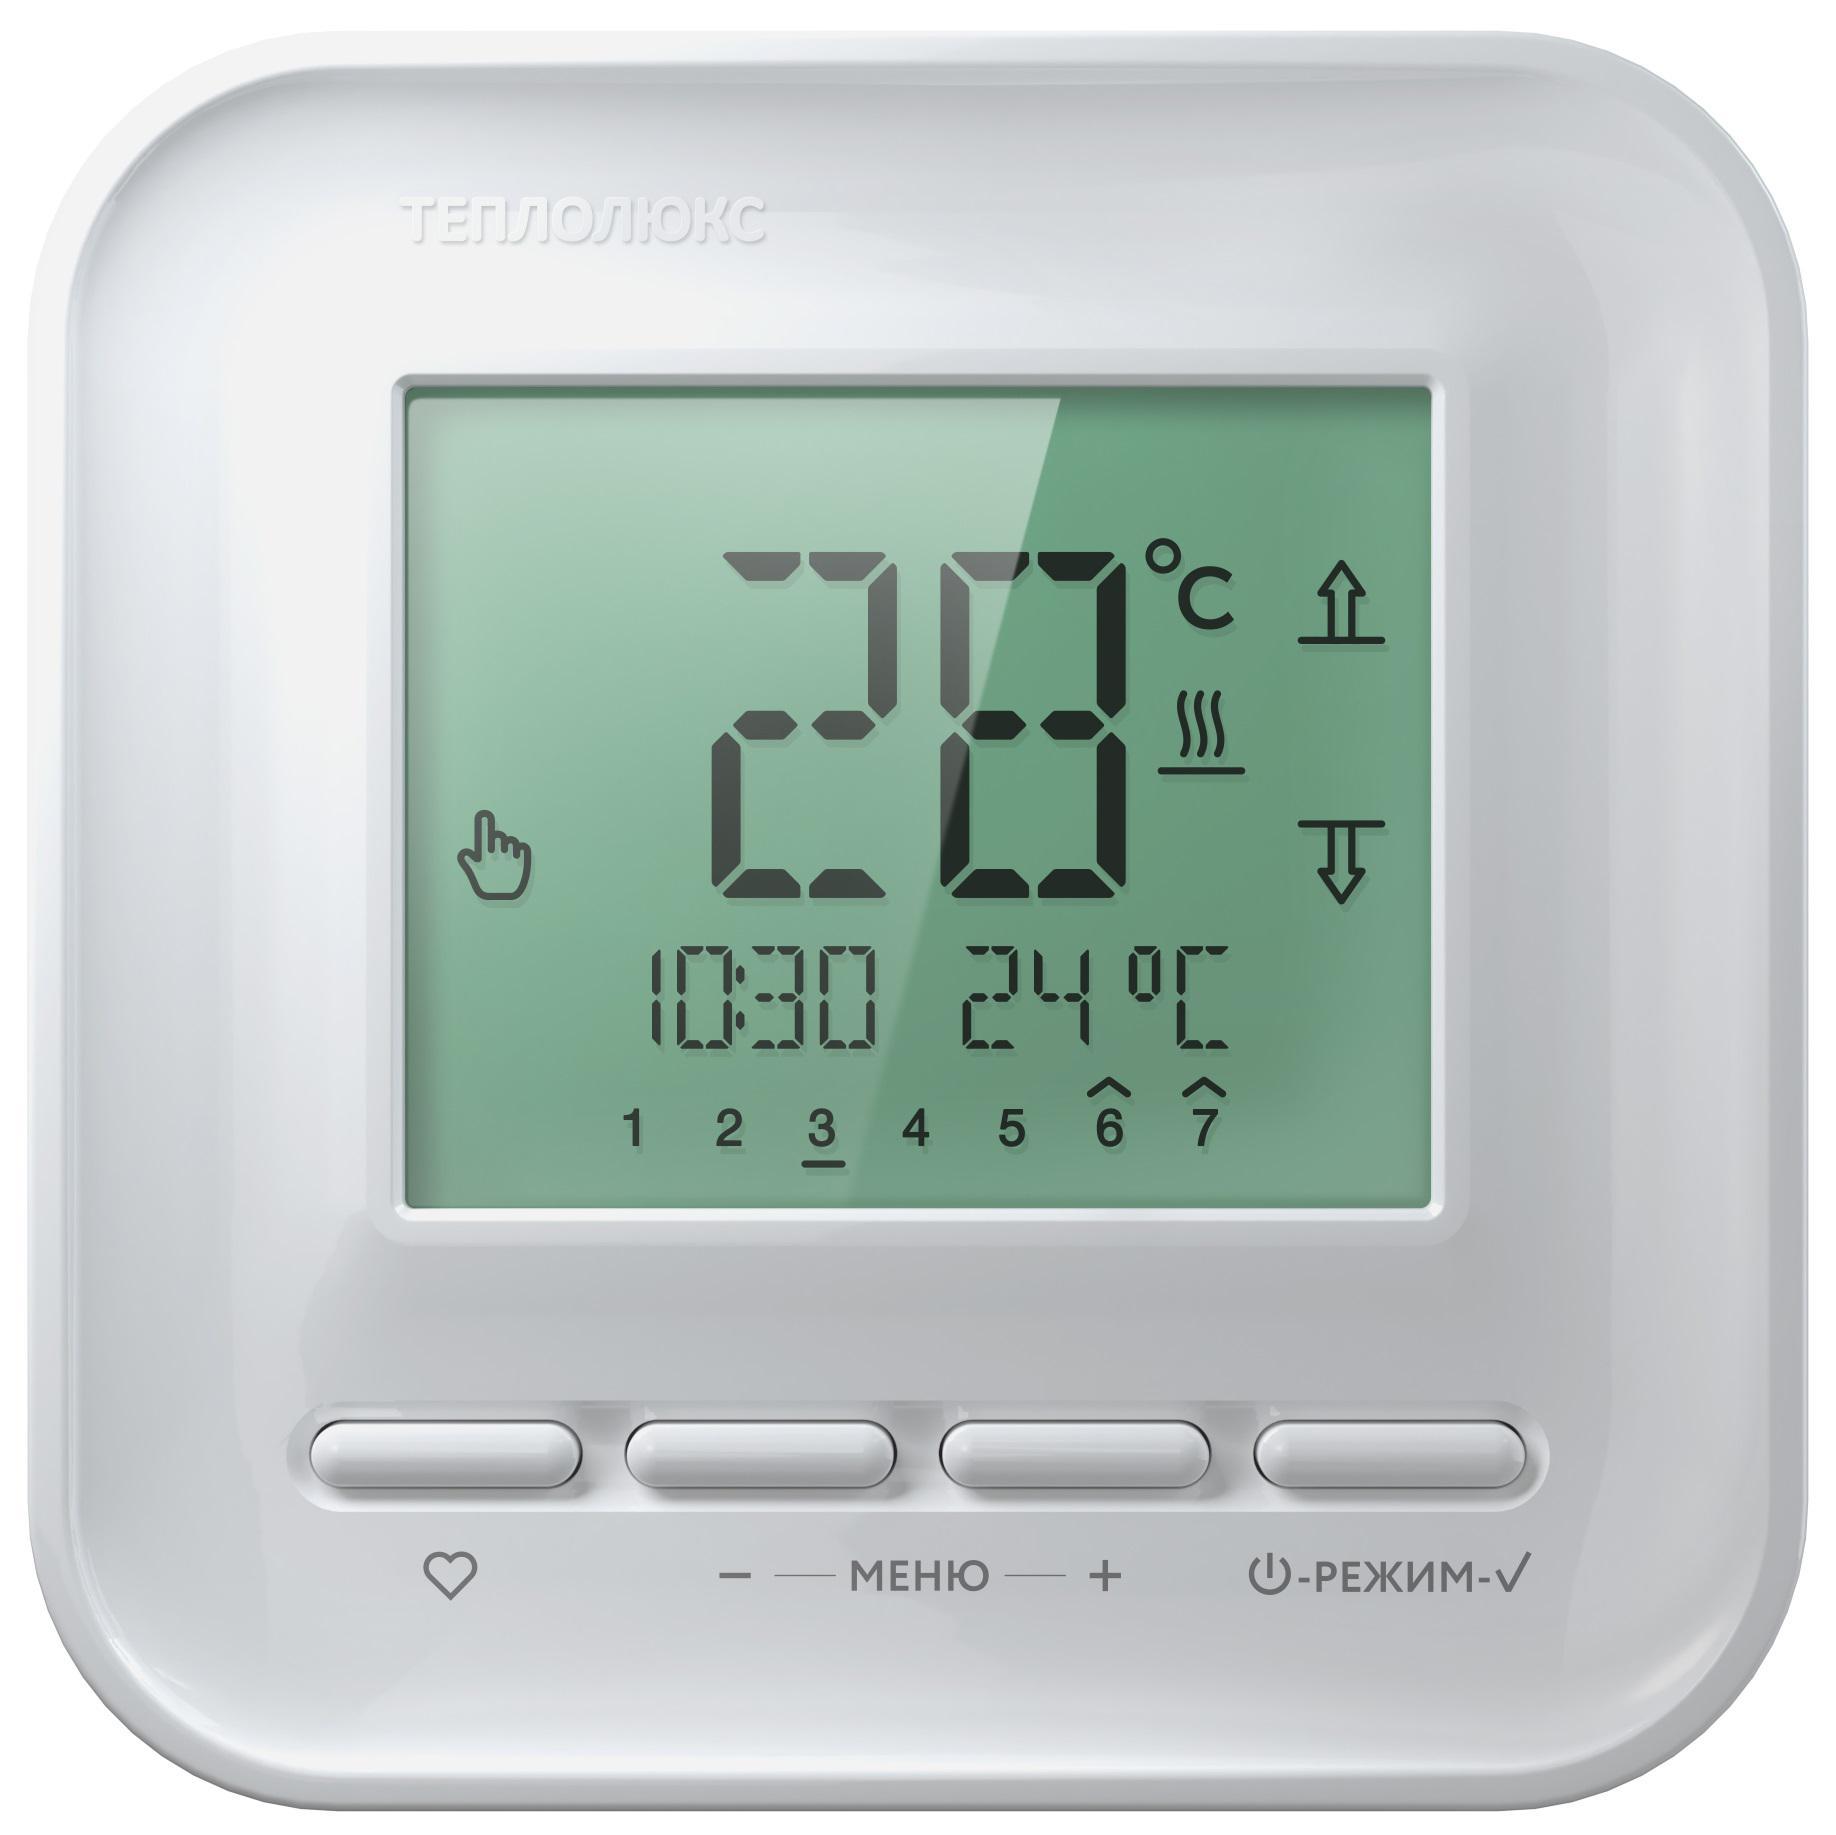 Терморегулятор ТЕПЛОЛЮКС ТЕПЛОЛЮКС 515 теплый пол теплолюкс profimat160 10 0